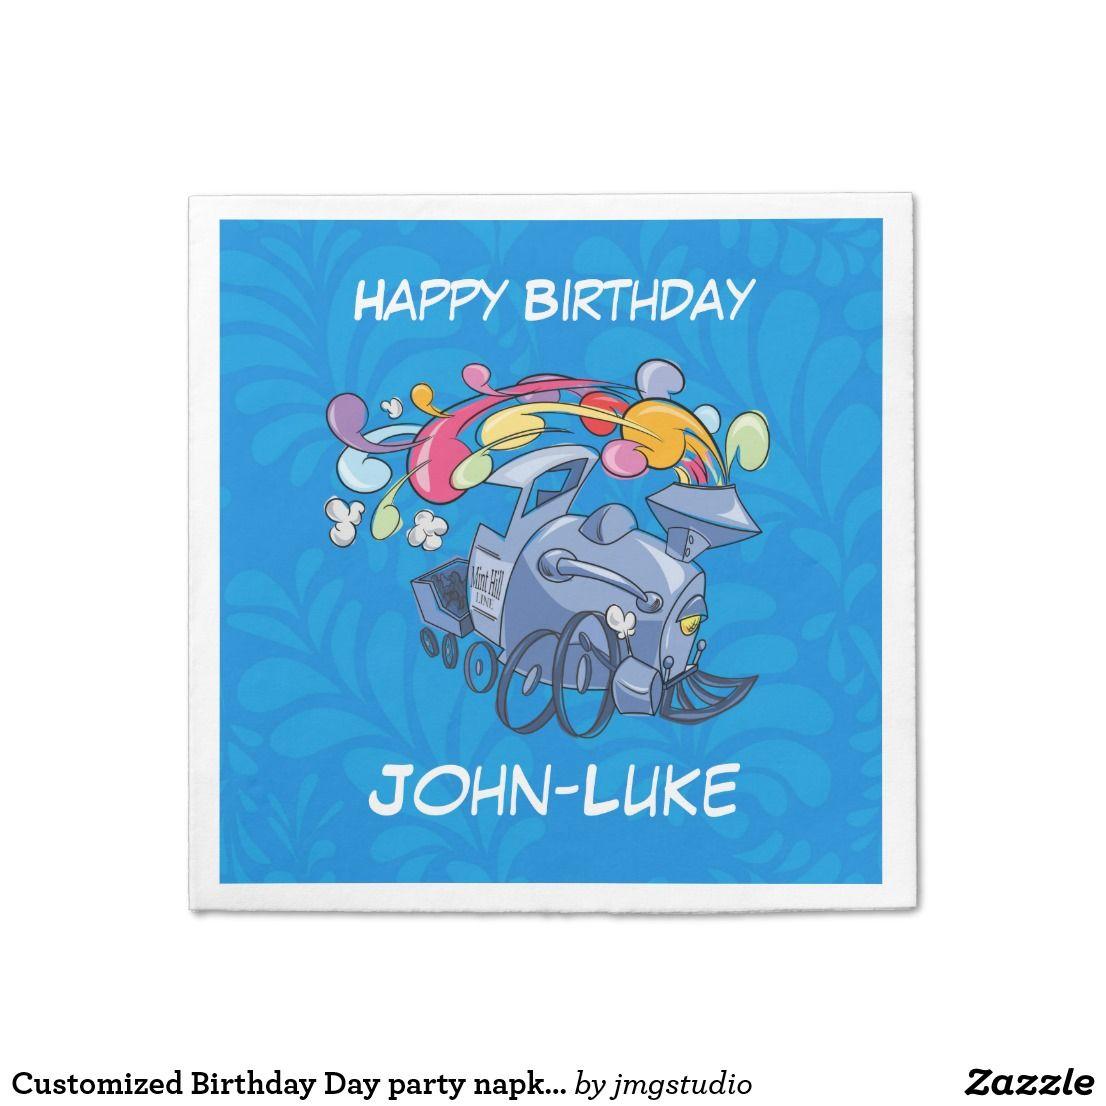 Customized Birthday Day party napkins